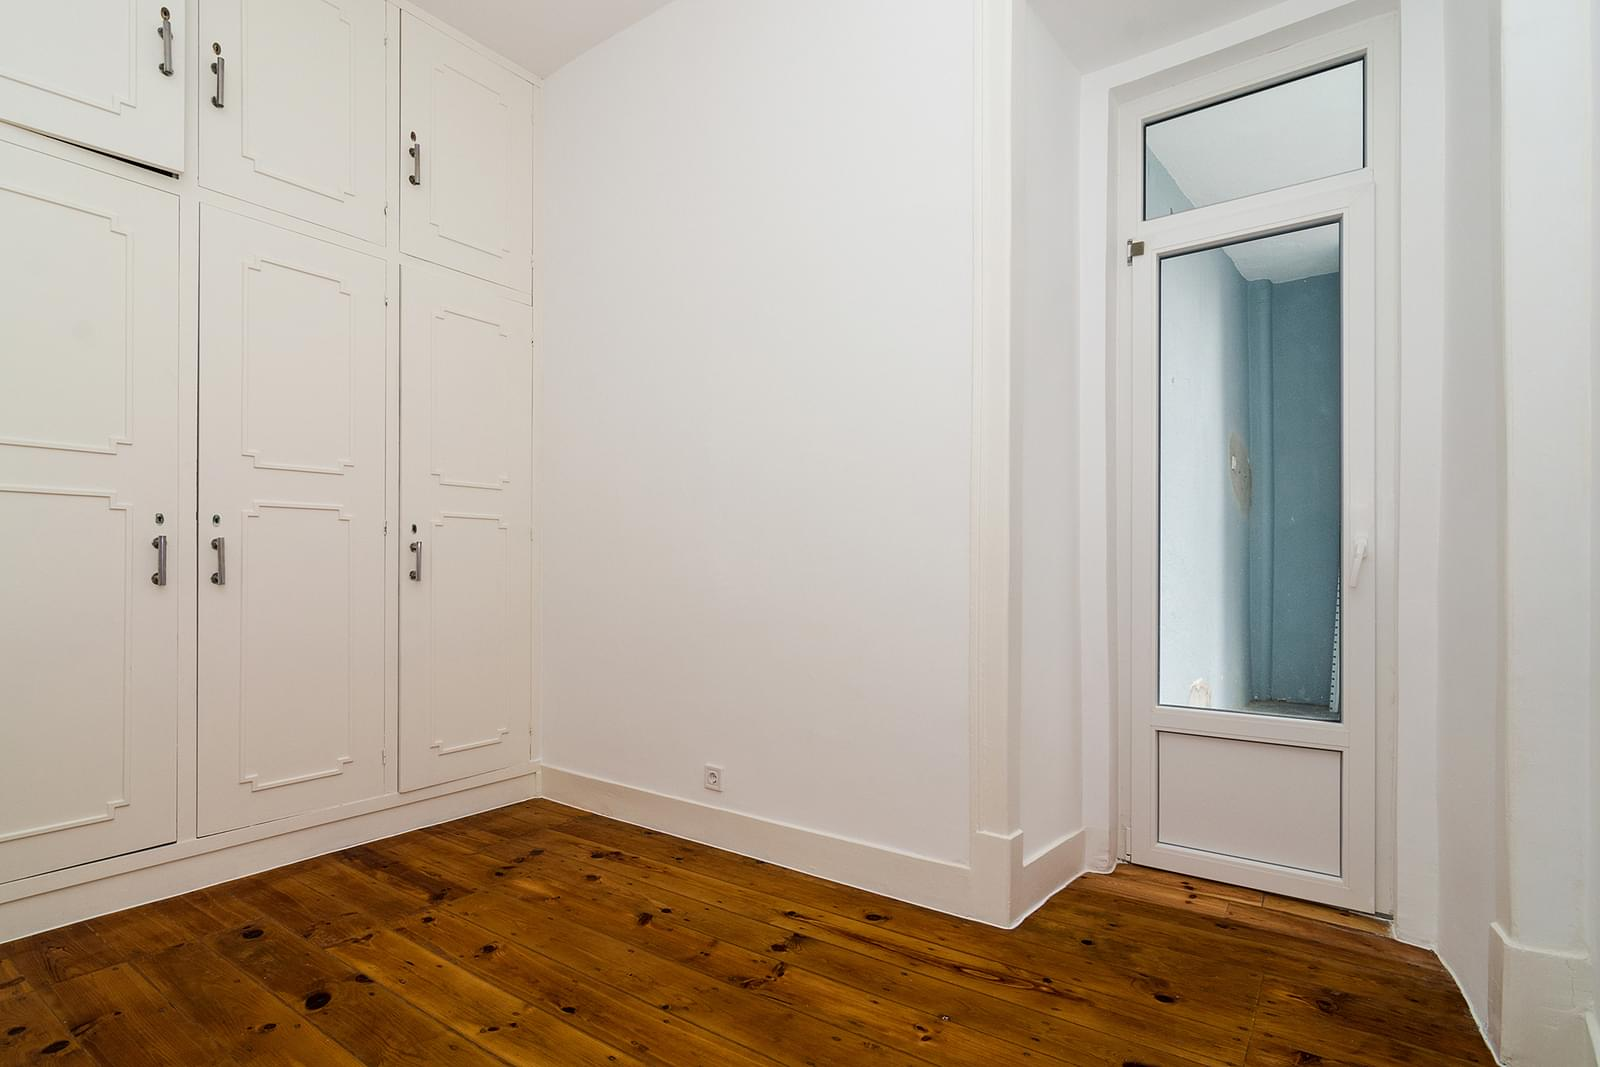 pf17267-apartamento-t3-lisboa-14815722-7368-45ec-b0ad-10fcf557c62b